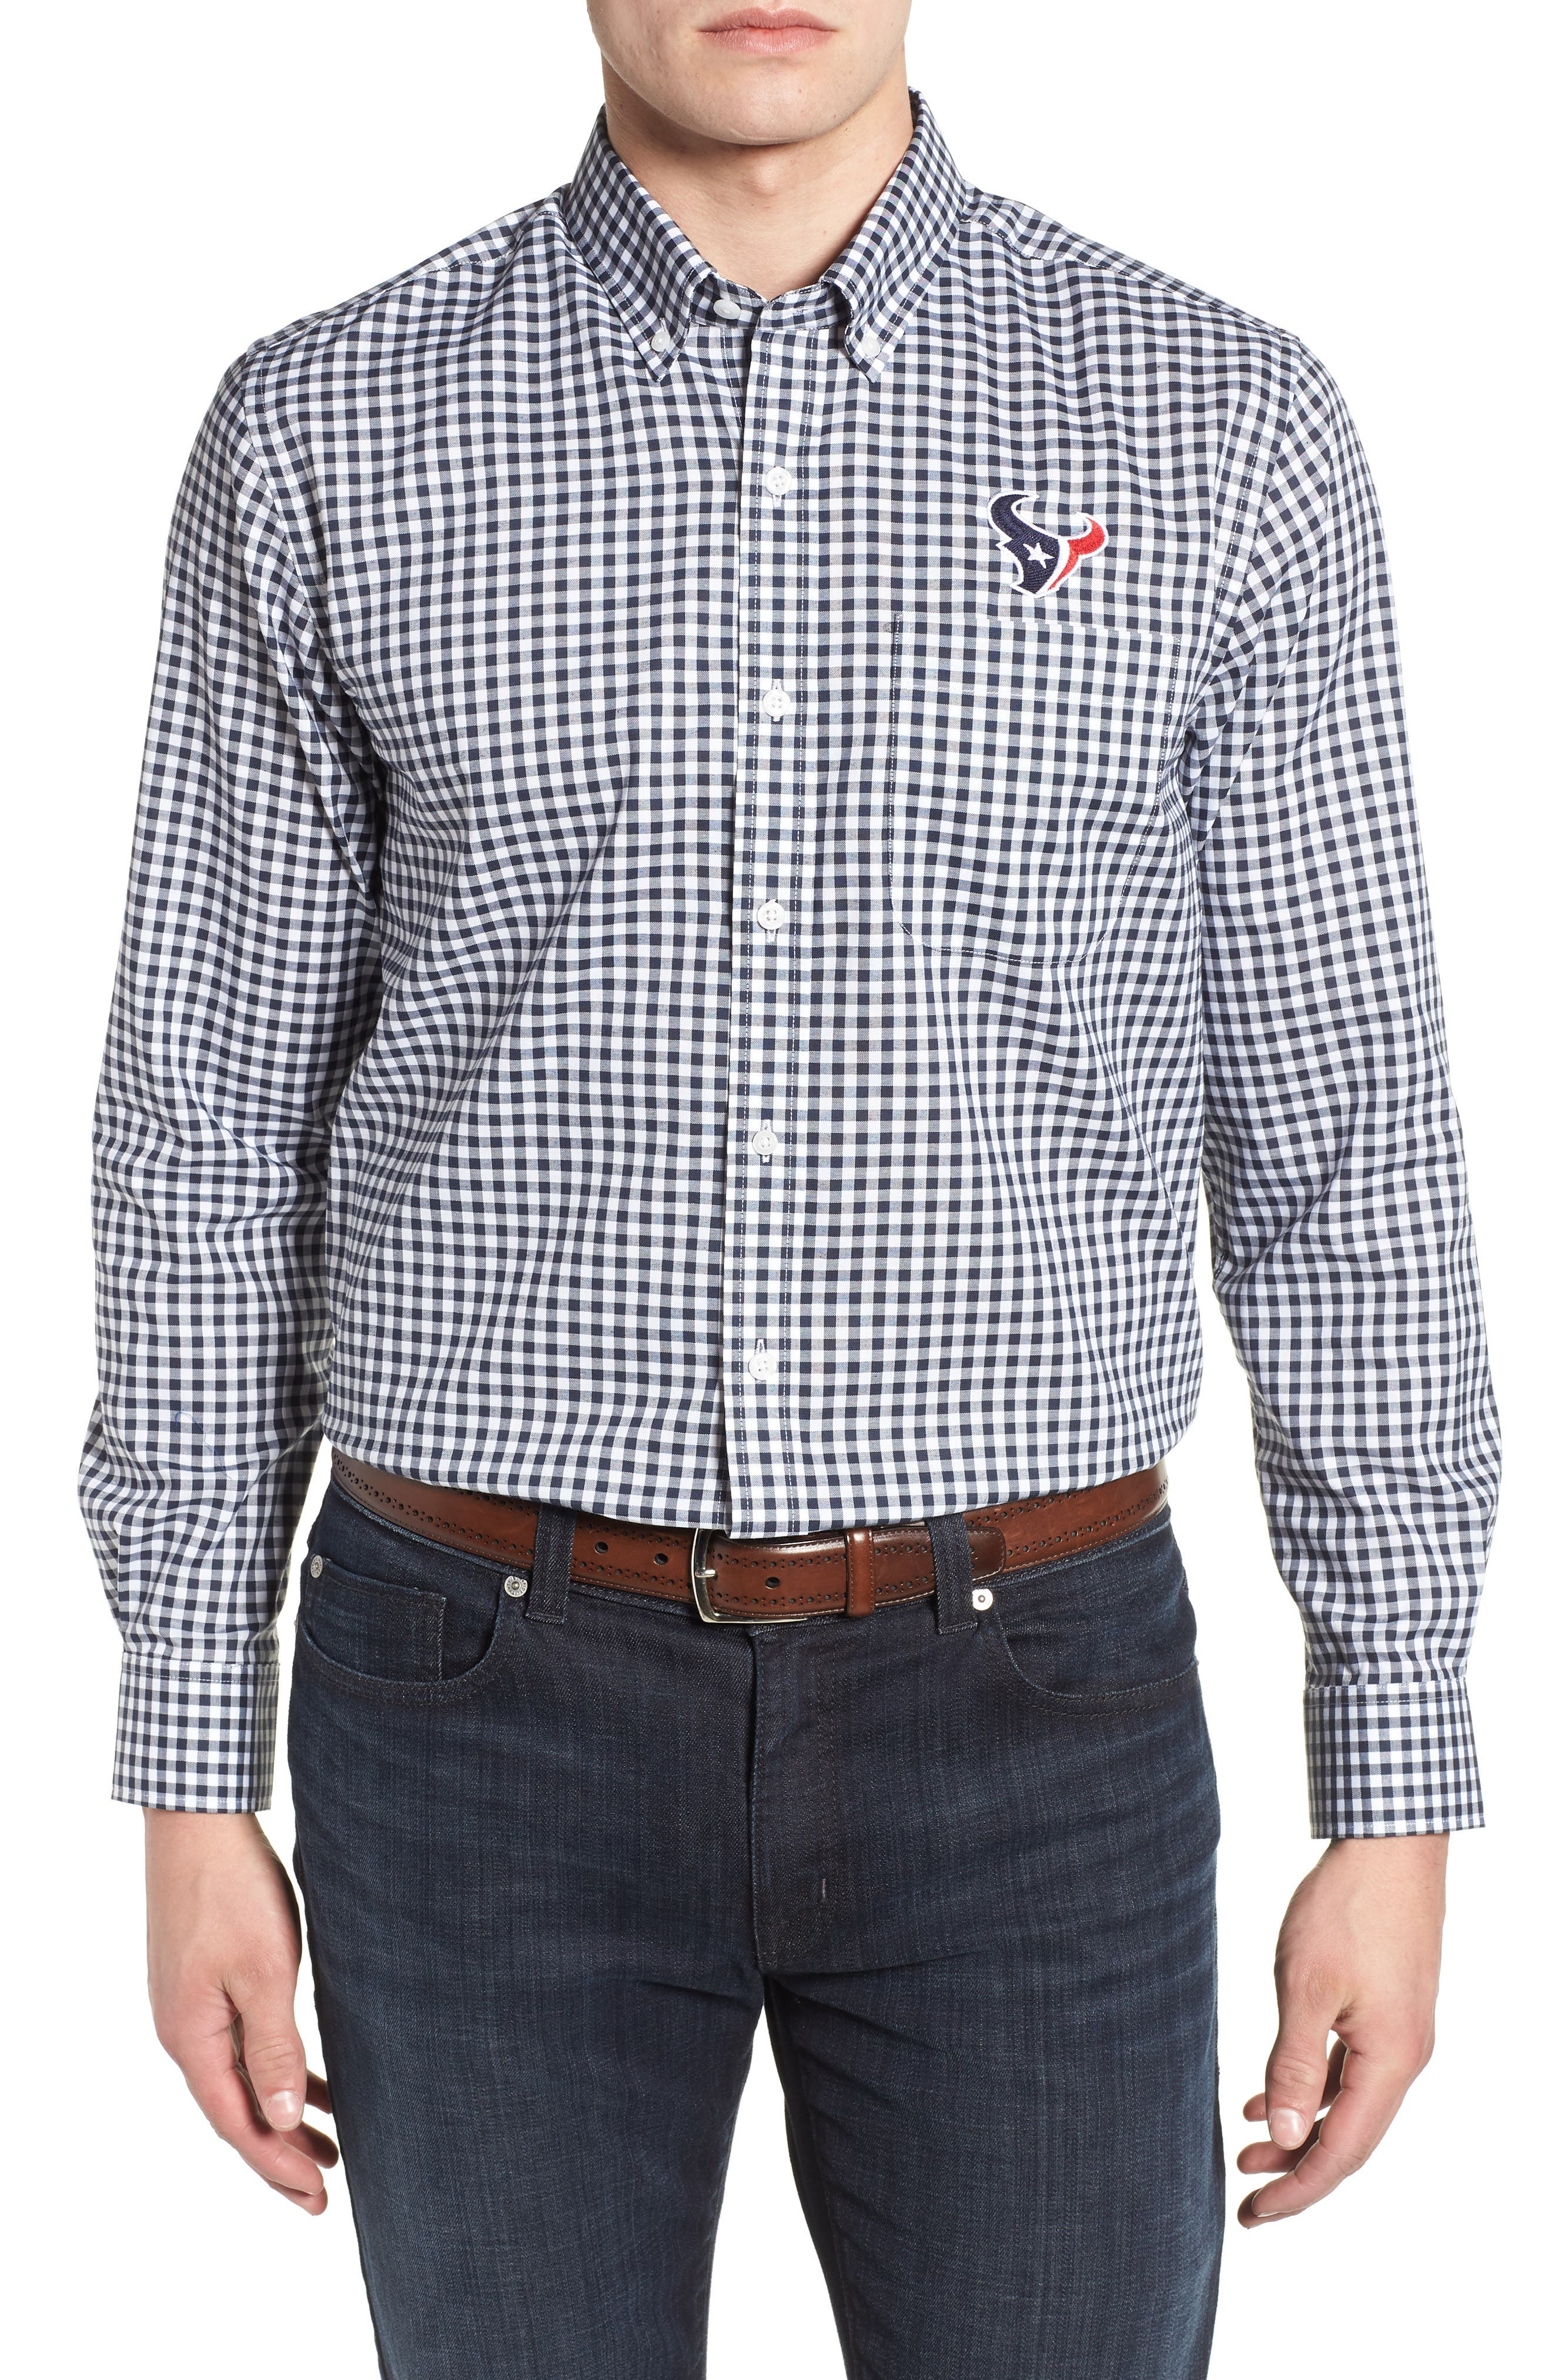 League Houston Texans Regular Fit Shirt,                             Main thumbnail 1, color,                             LIBERTY NAVY